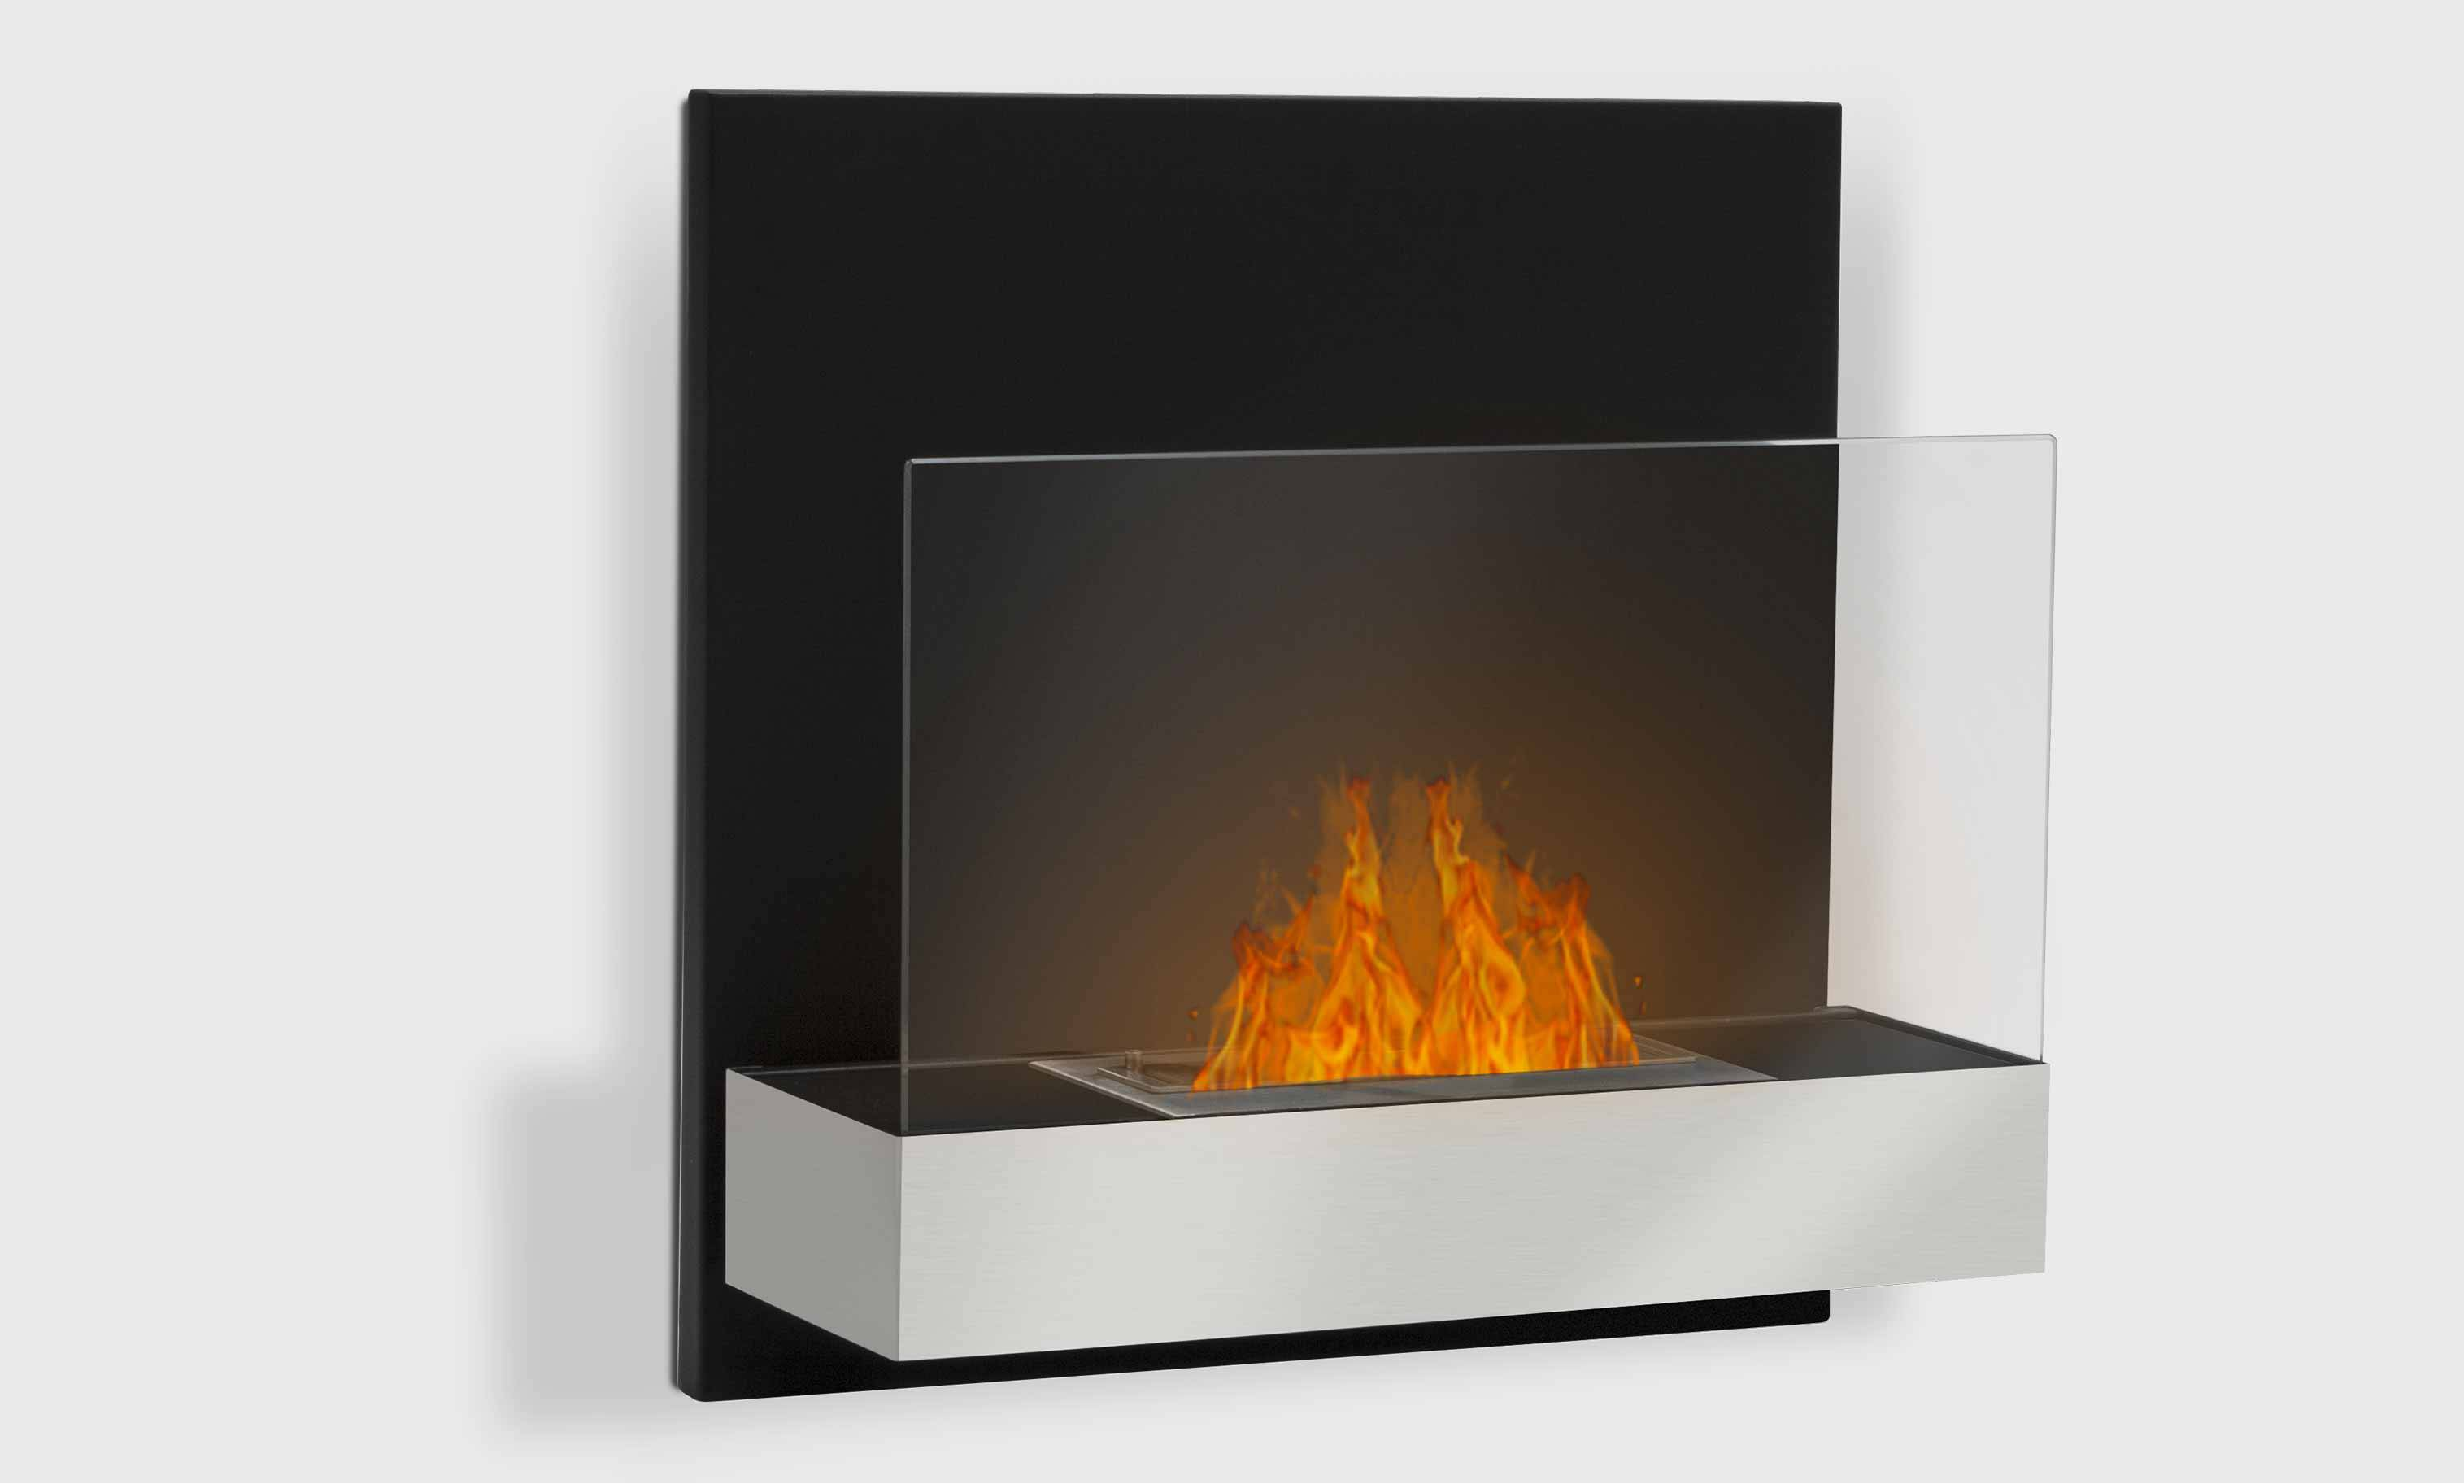 foyer ethanol mural tosno noir mat et inox. Black Bedroom Furniture Sets. Home Design Ideas